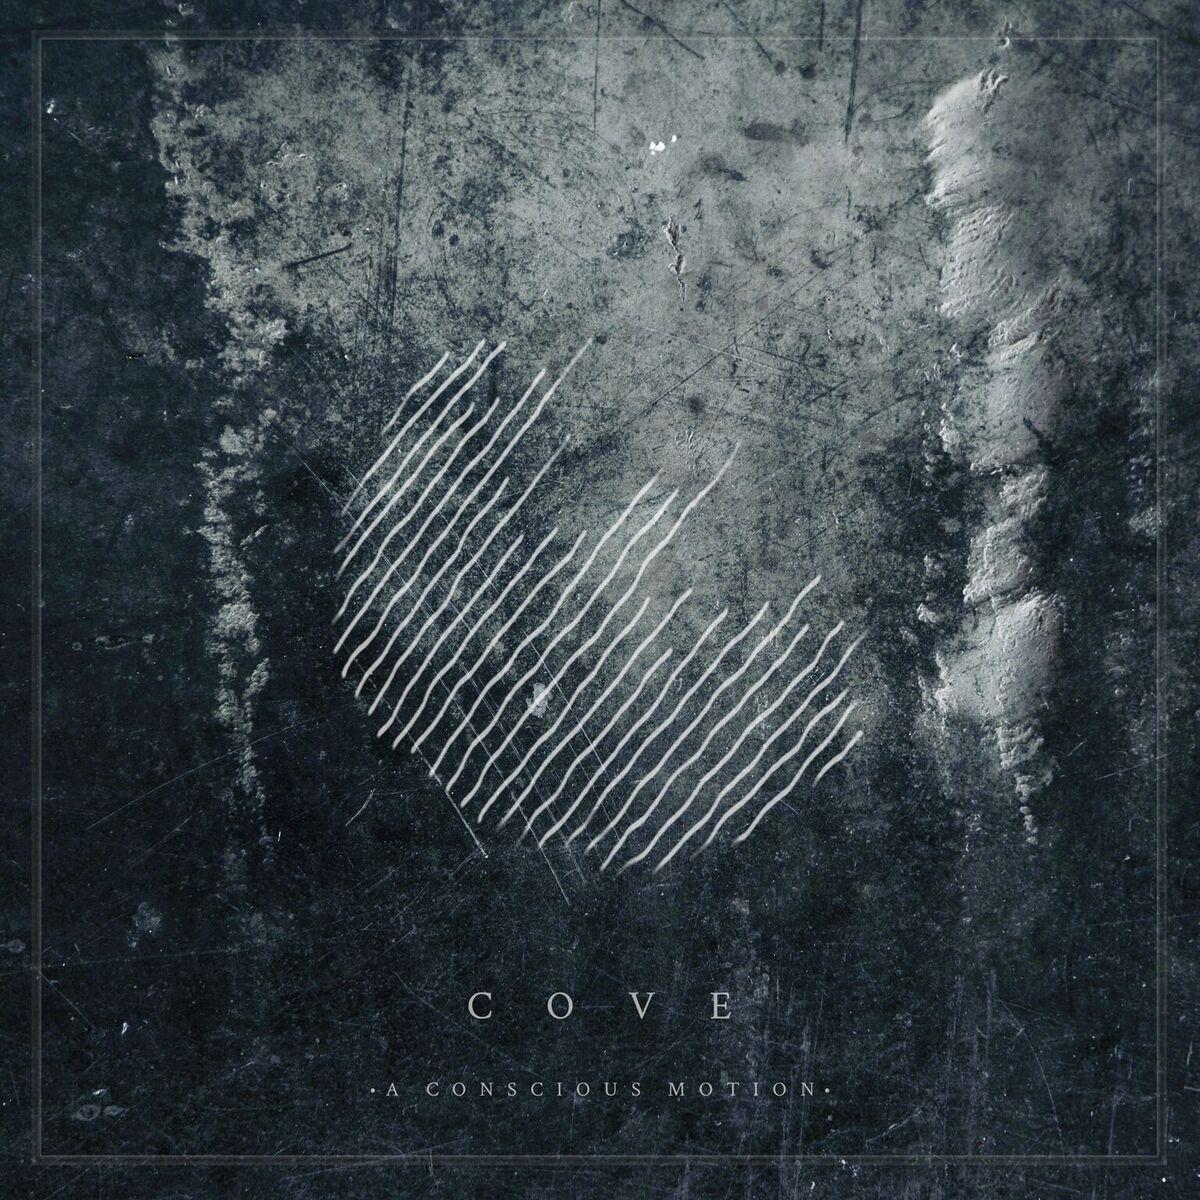 Cove - A Conscious Motion (Review)